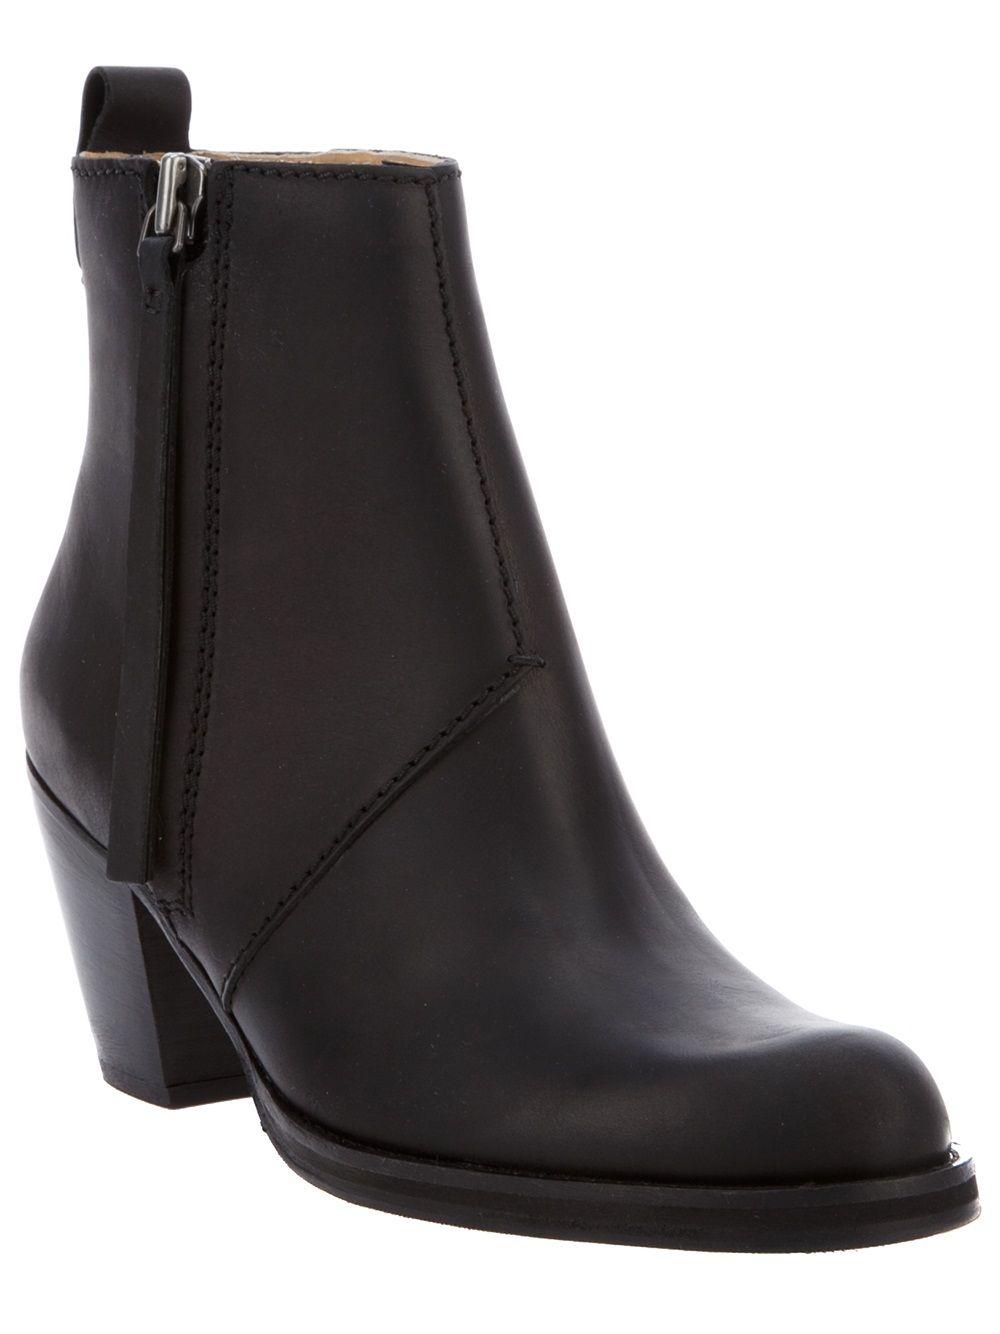 New pistol leather boots Acne Studios Designers